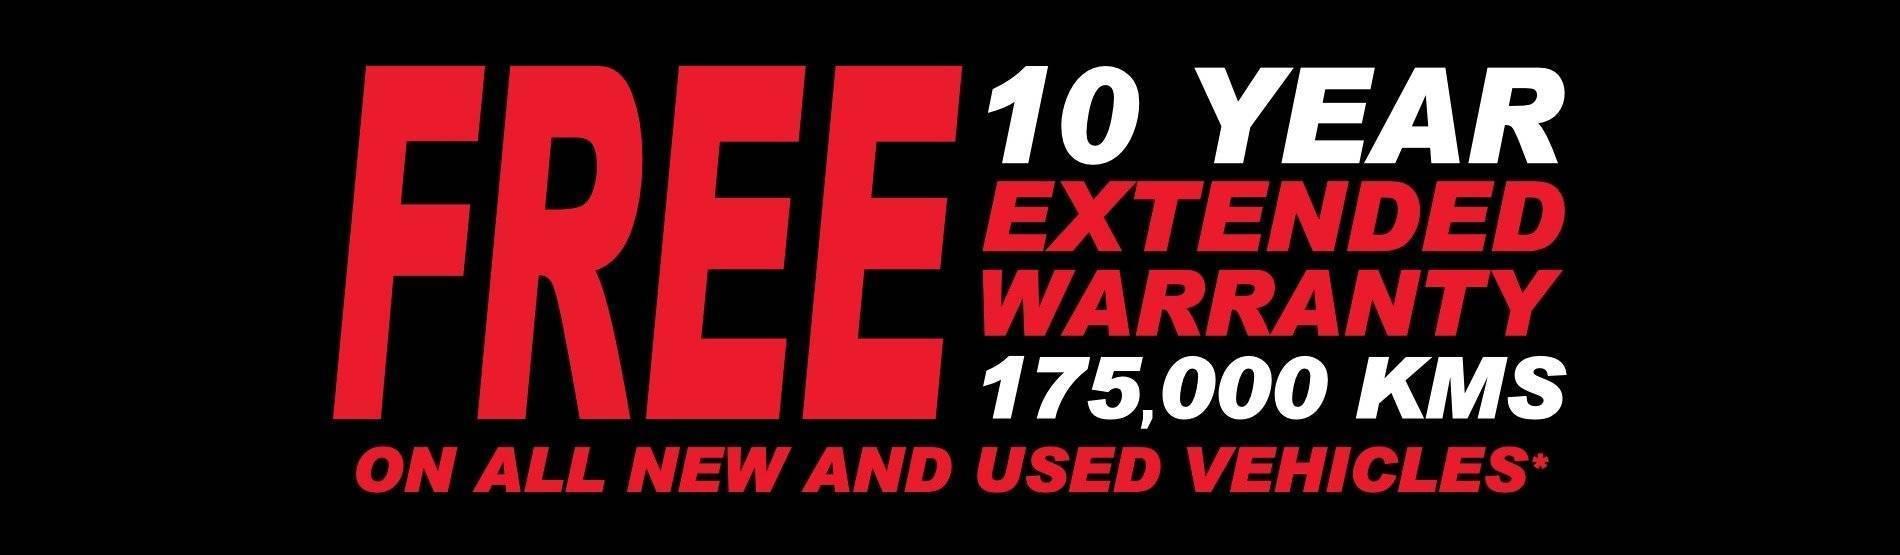 10 Year Extended Warranty